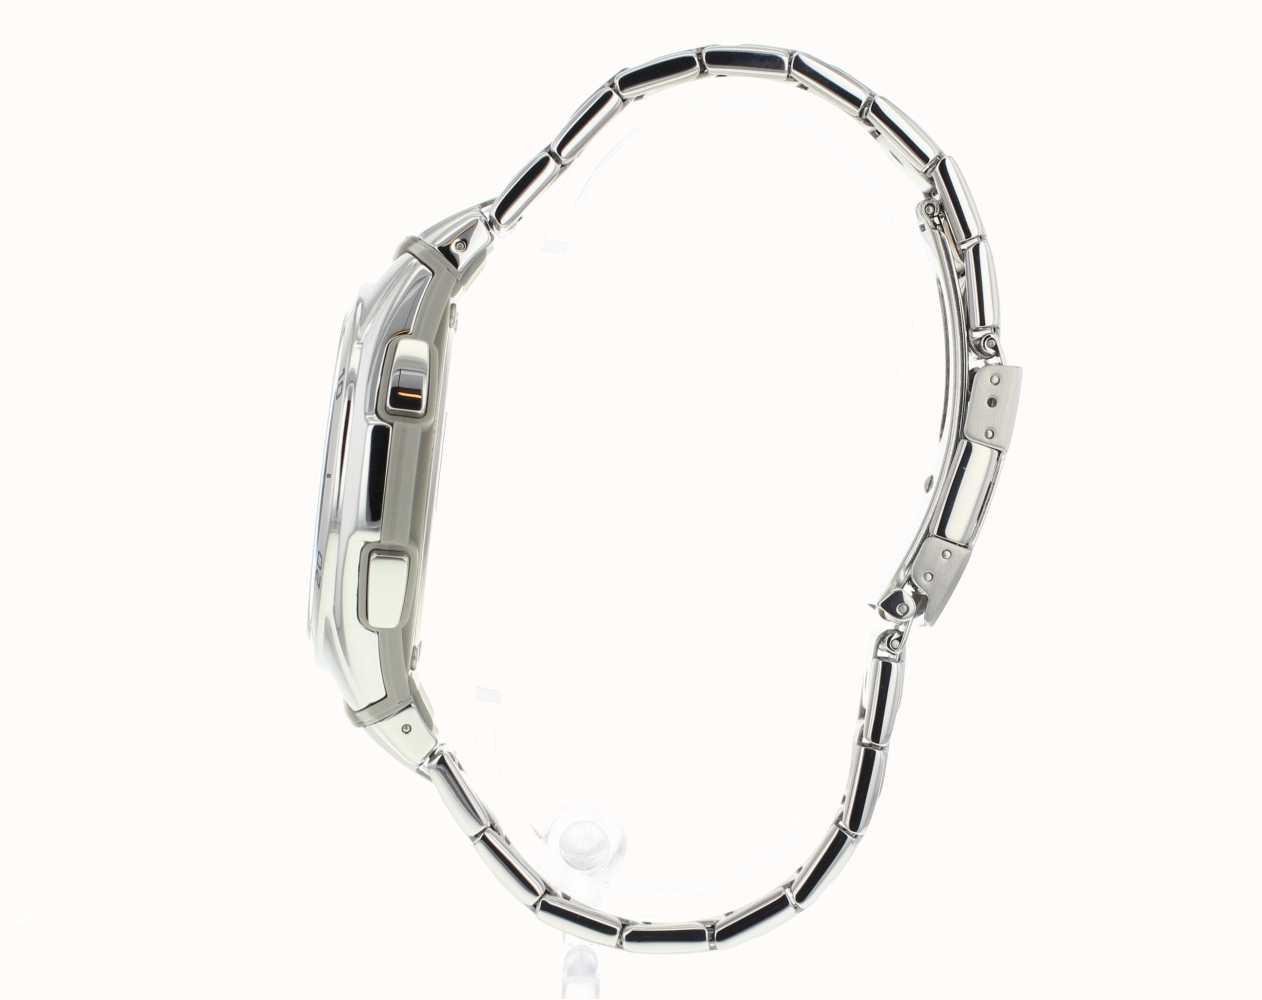 Casio Mens Wave Ceptor Blue Dial Stainless-Steel Watch WVA